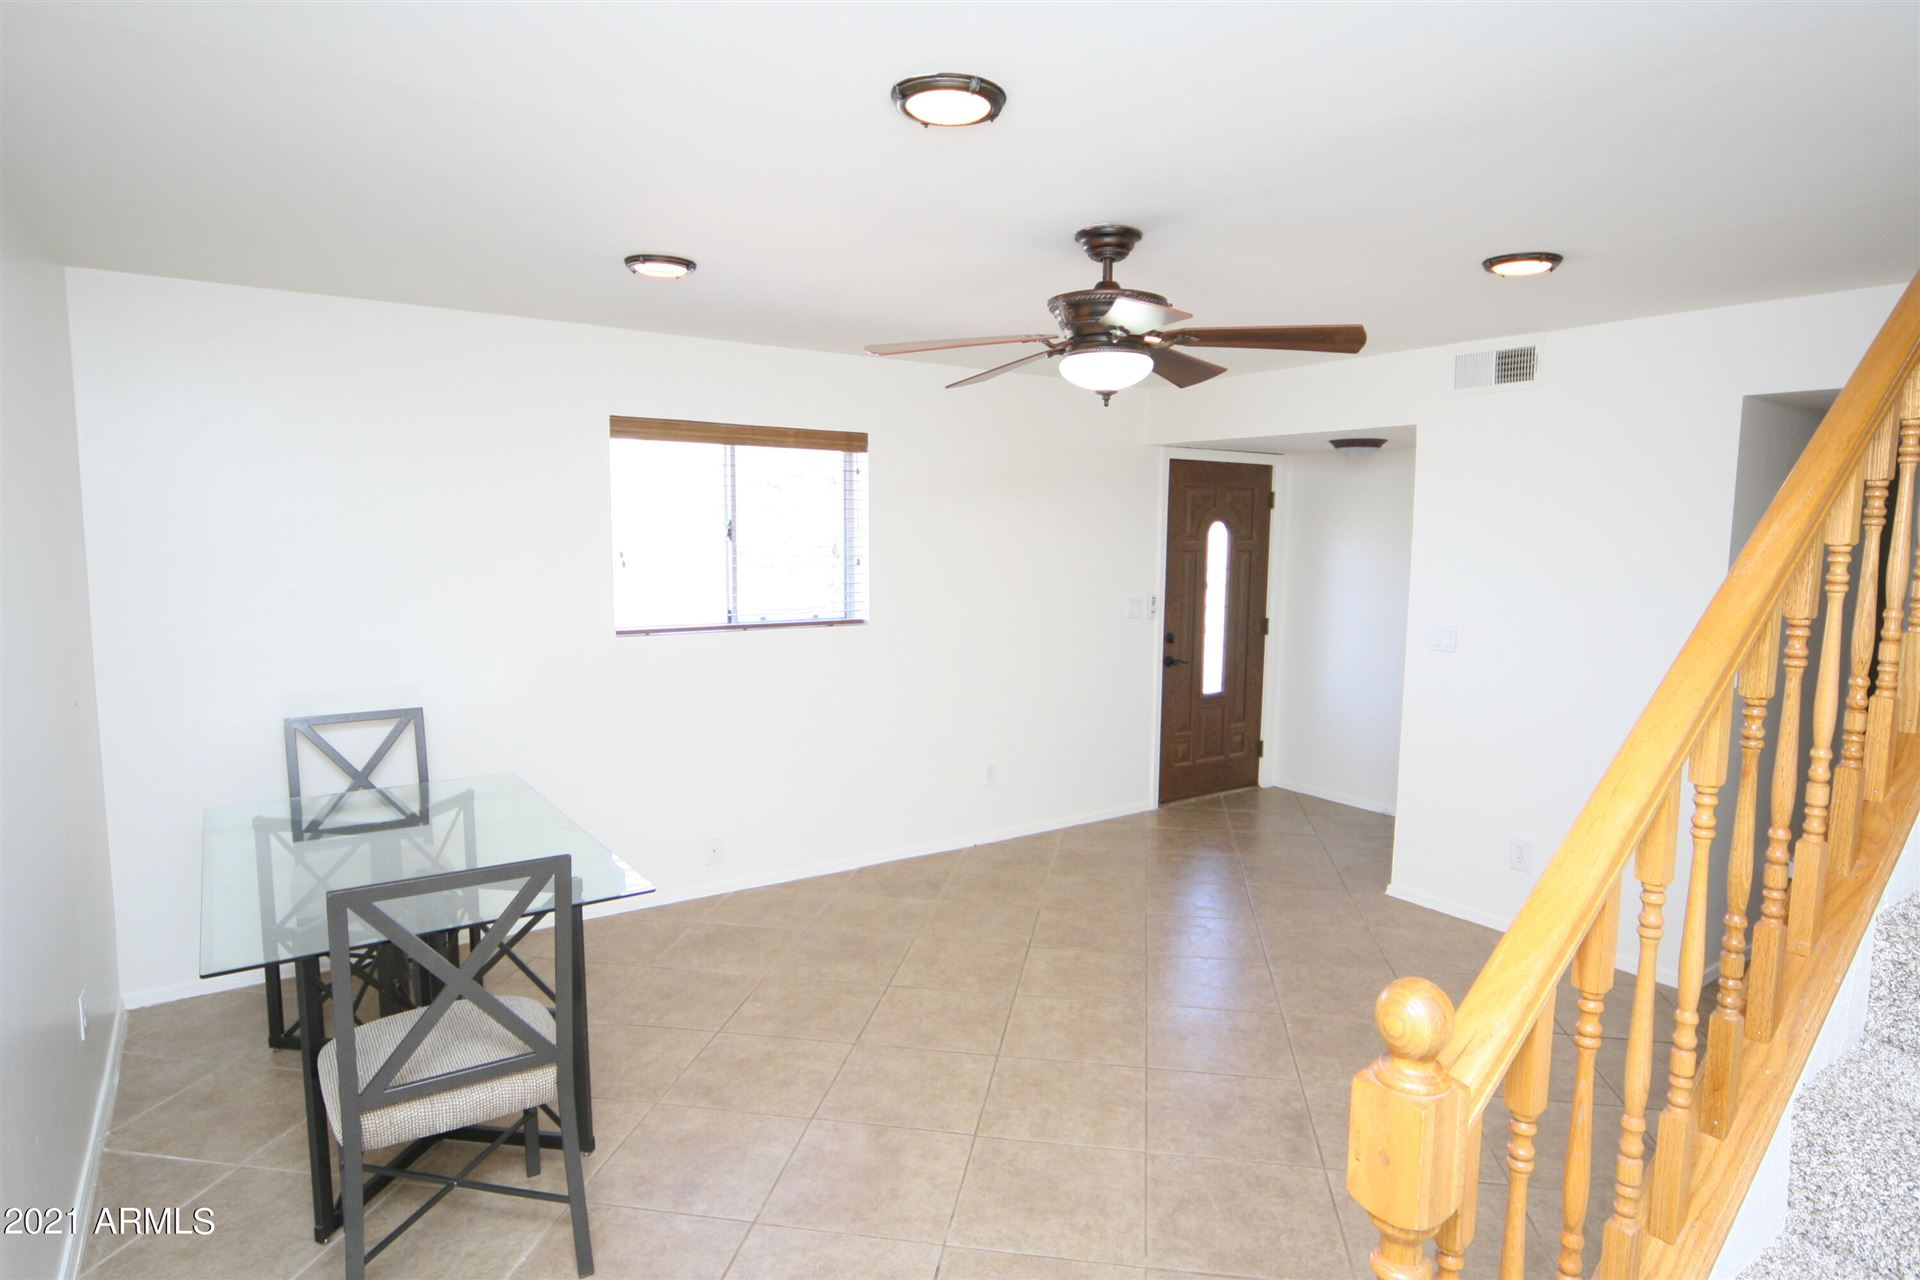 Photo of 5675 E 16TH Avenue, Apache Junction, AZ 85119 (MLS # 6306184)